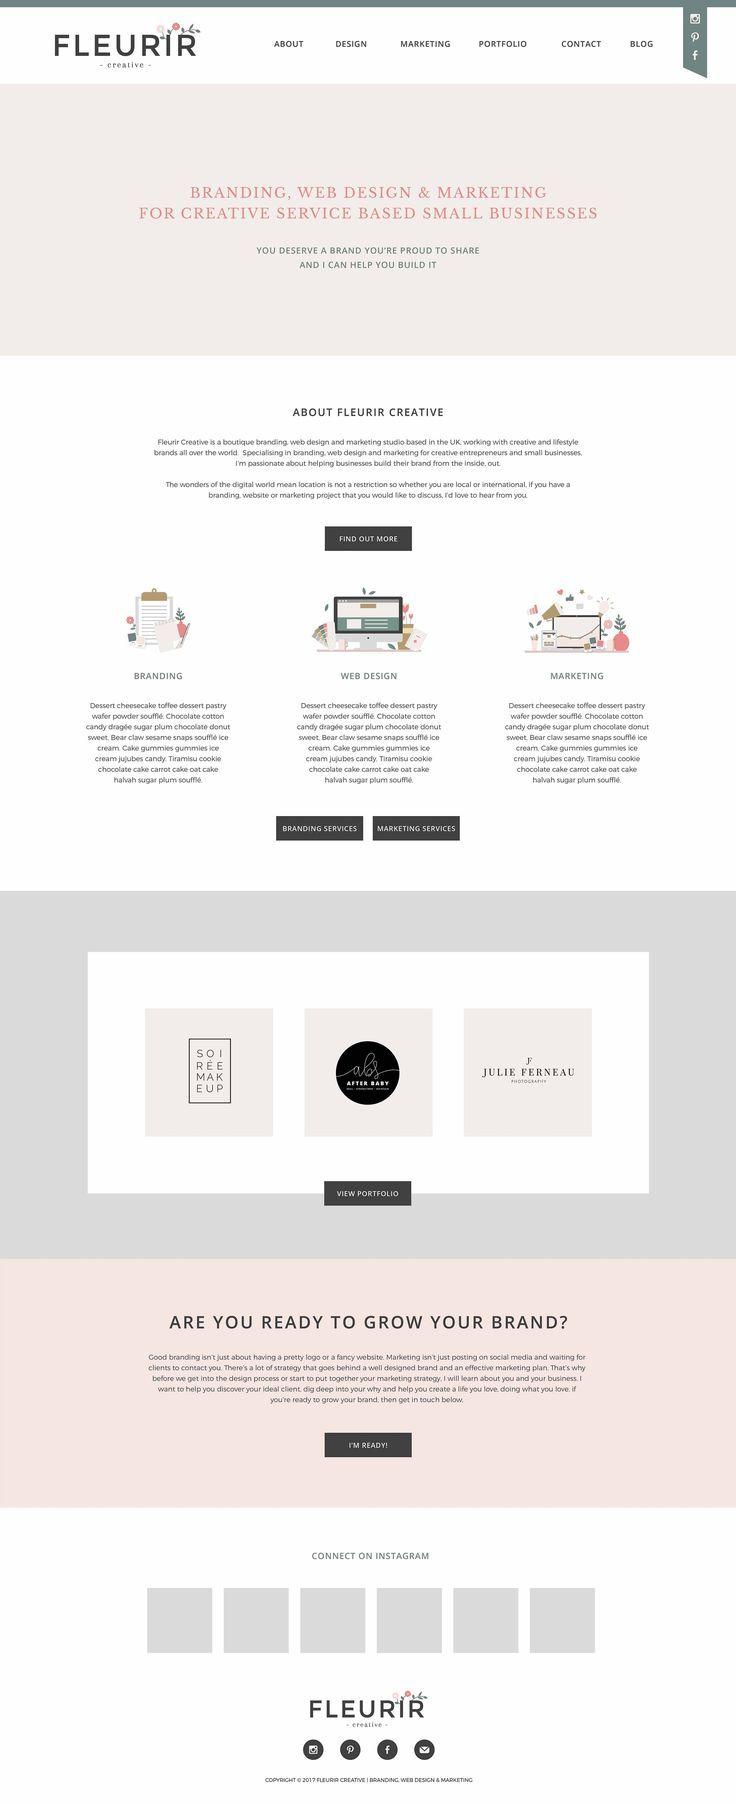 Fleurir Creative Homepage Design   Designed by Fleurir Creative